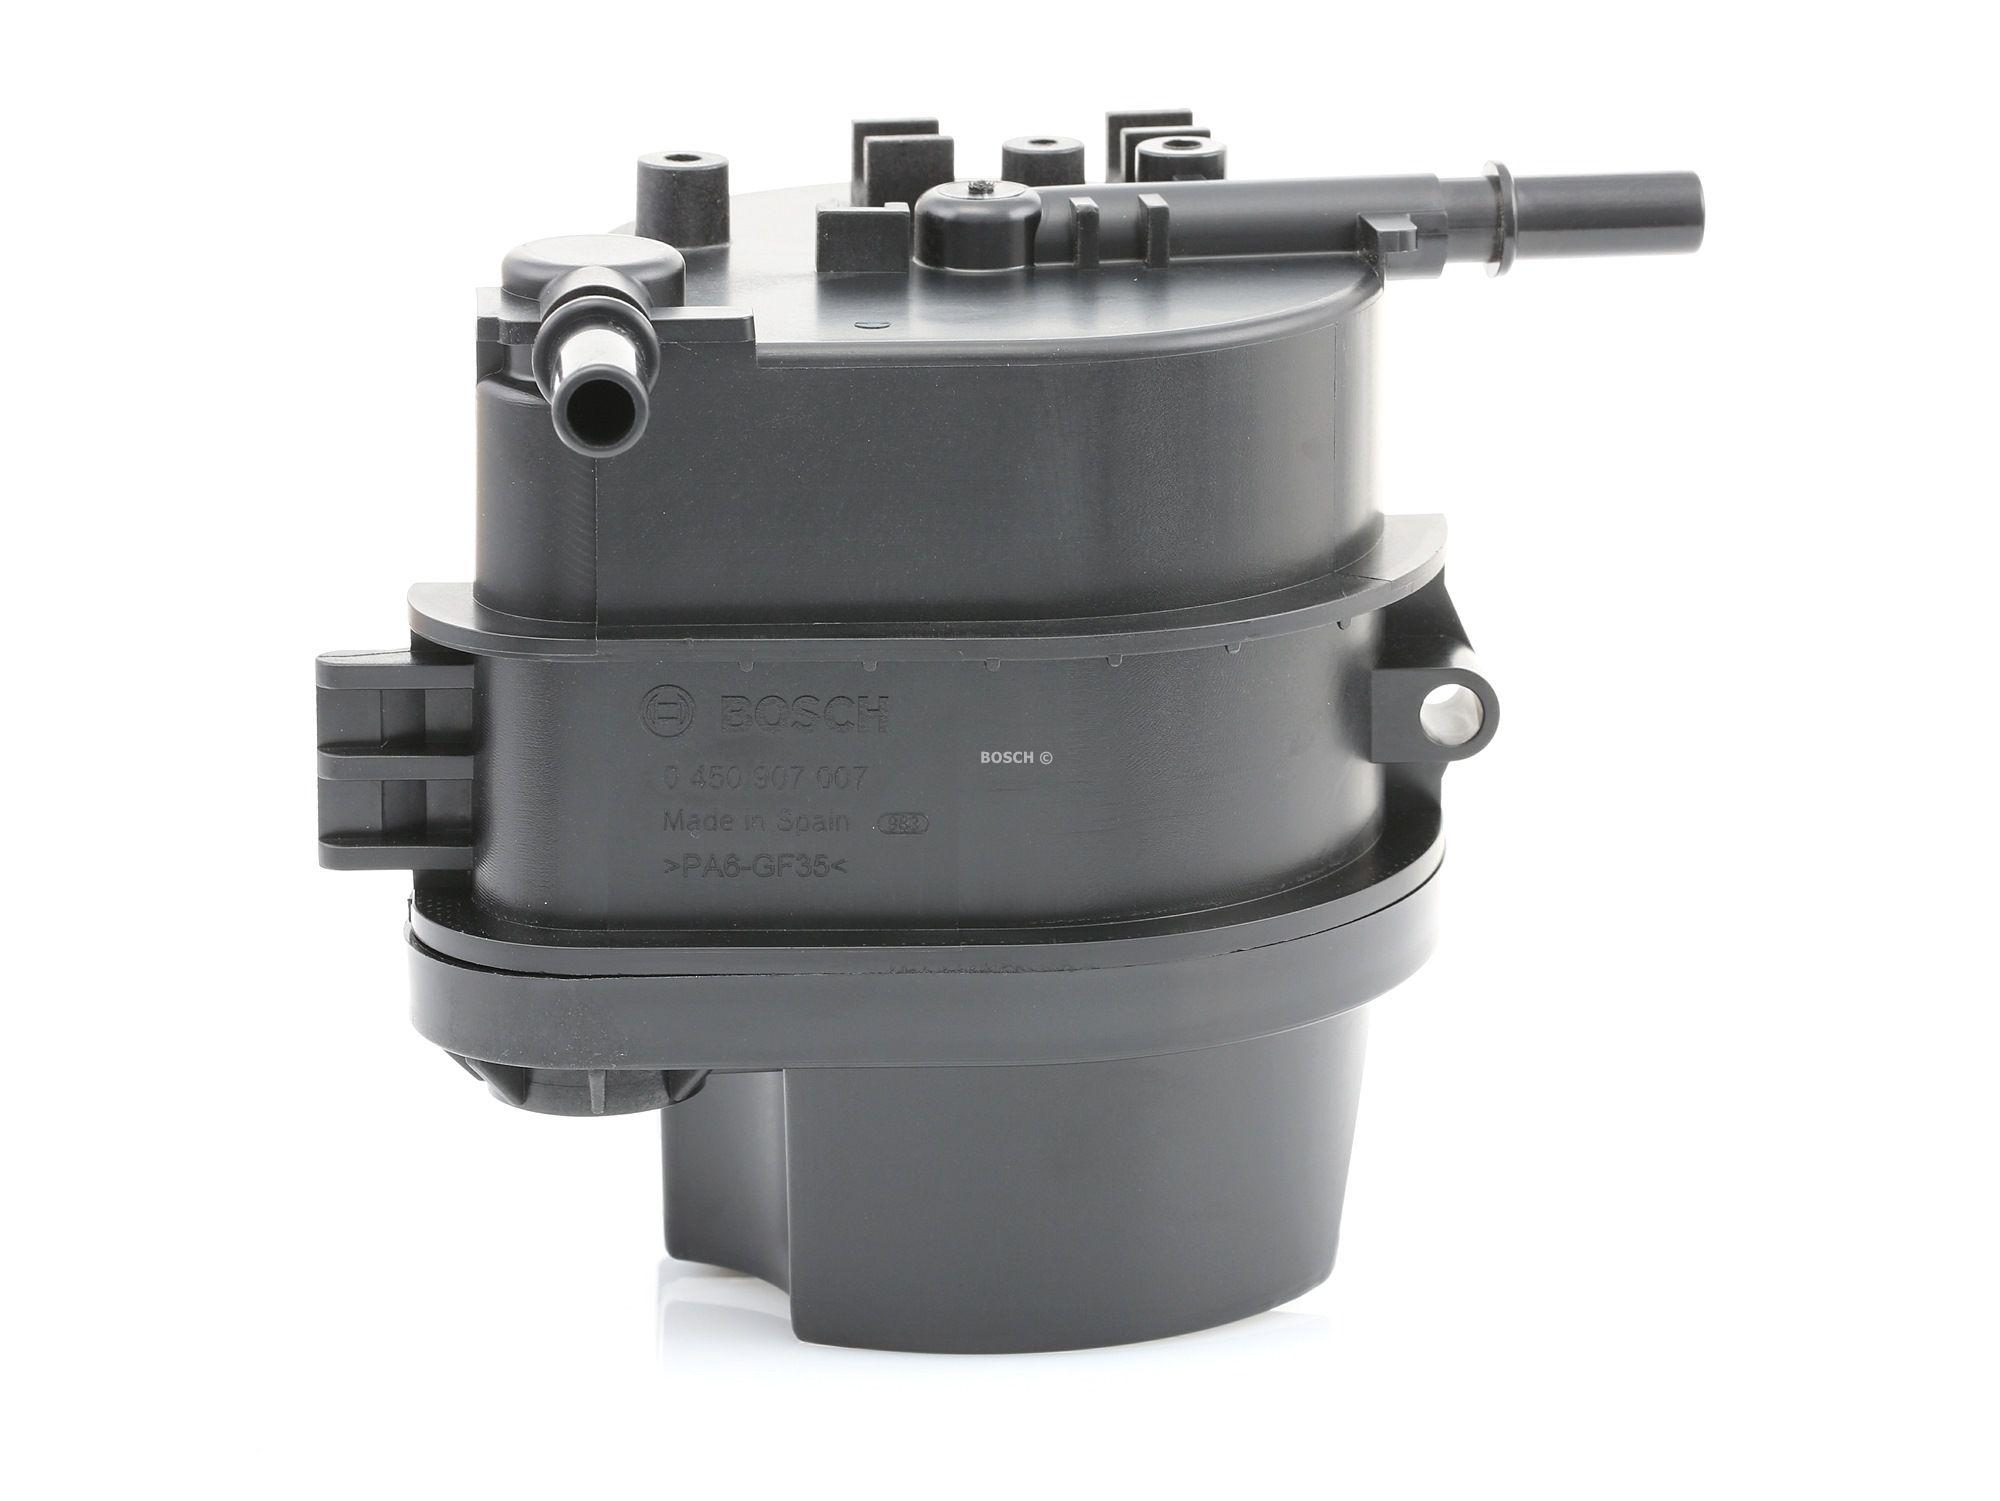 Original Palivový filtr 0 450 907 007 Toyota